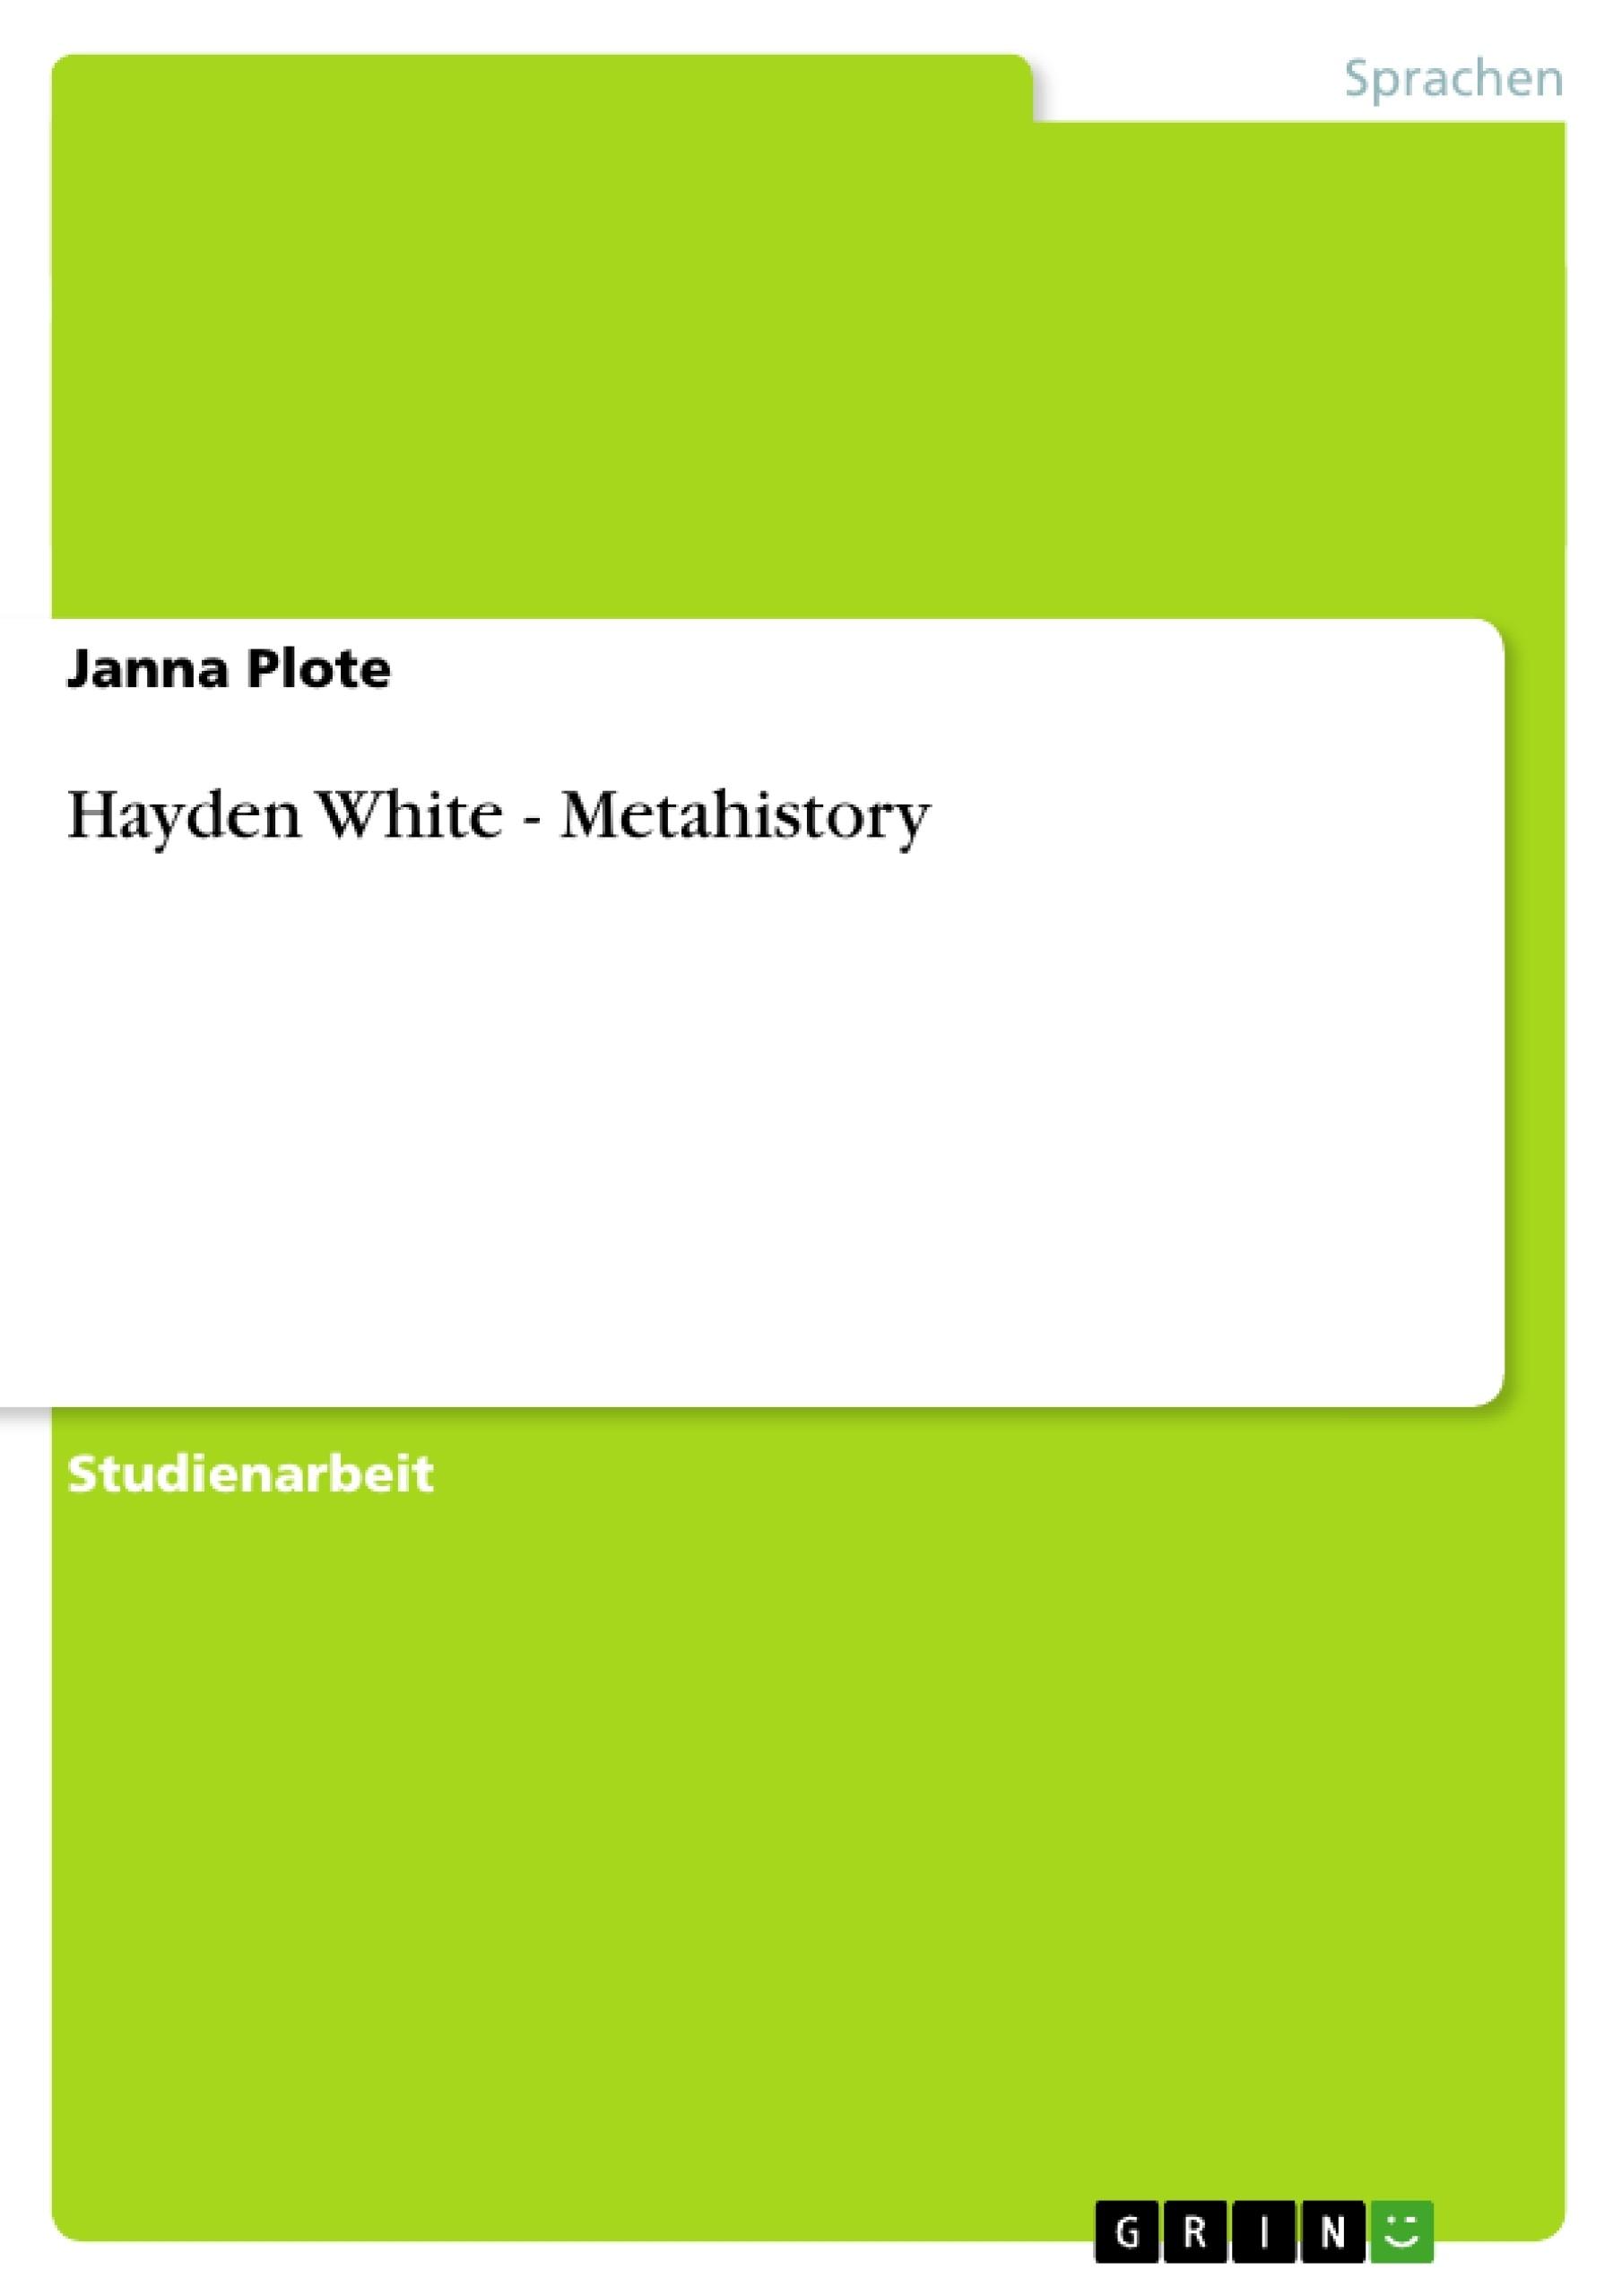 Titel: Hayden White - Metahistory